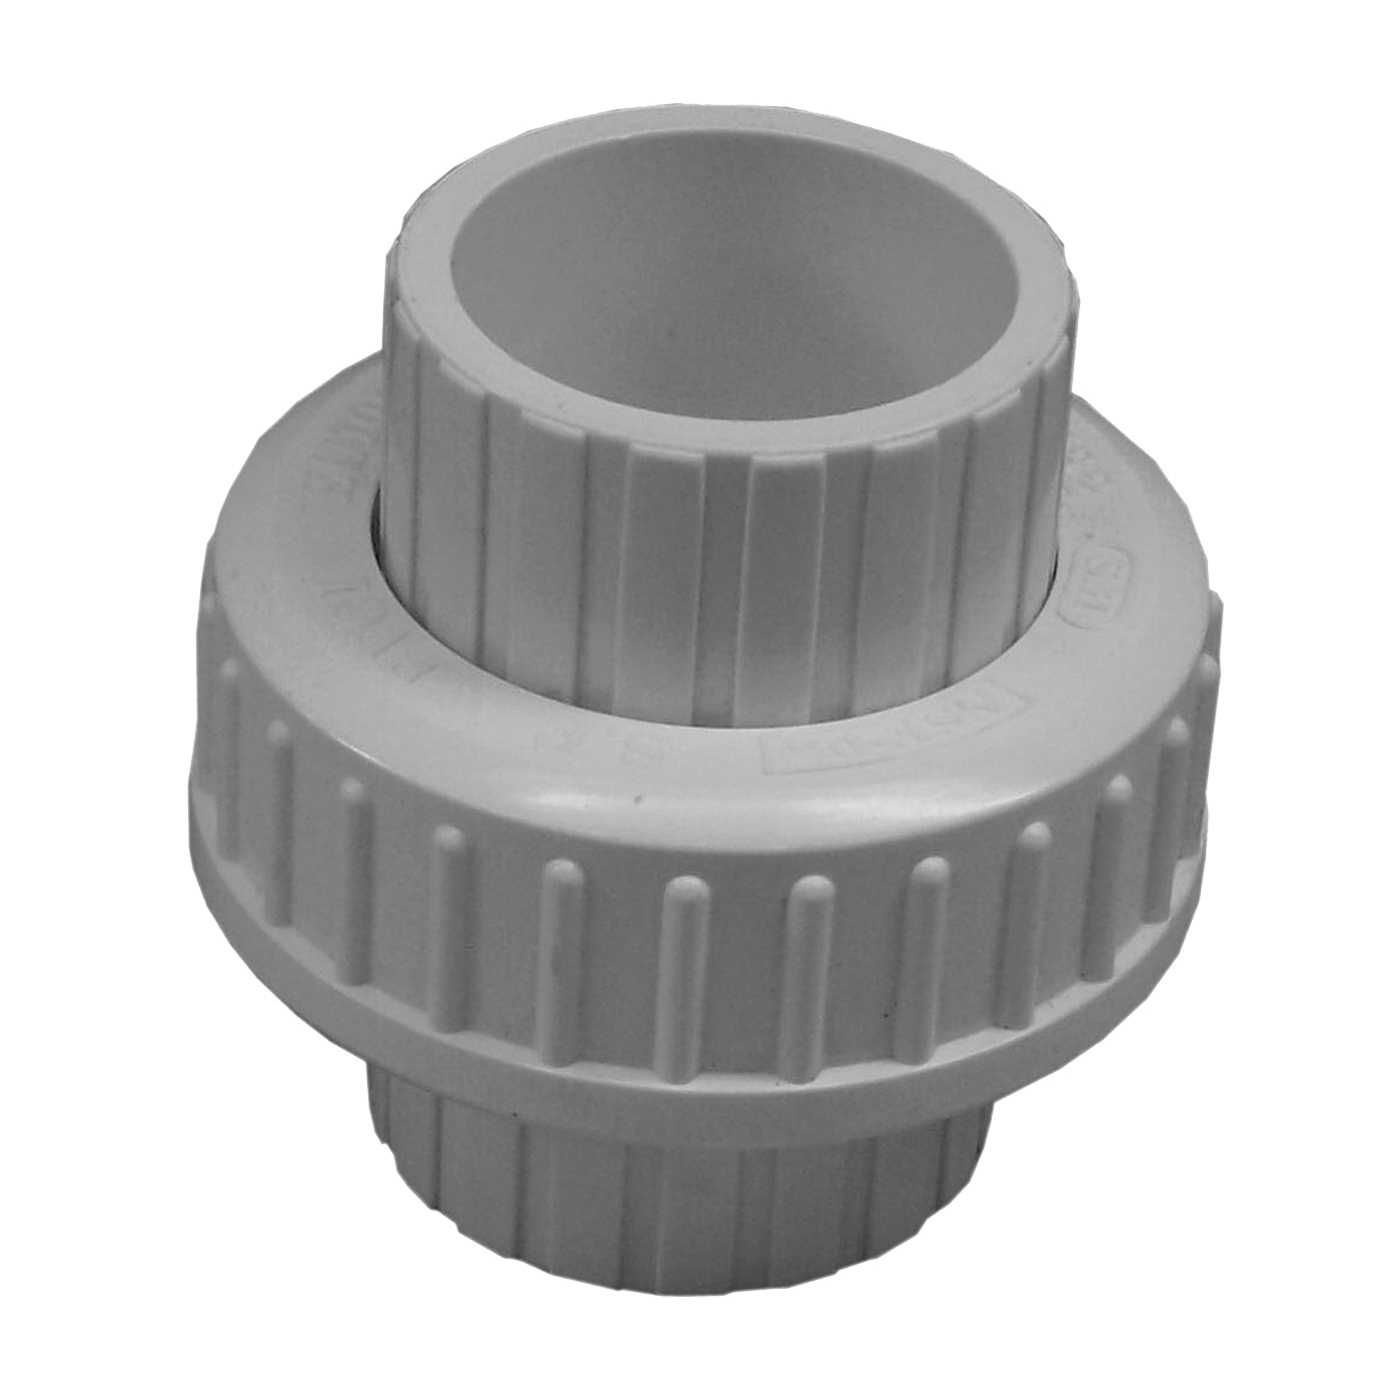 Picture of GENOVA 300 Series 37210 Pipe Union, 1 in, Slip Joint, SCH 40 Schedule, 150 psi Pressure